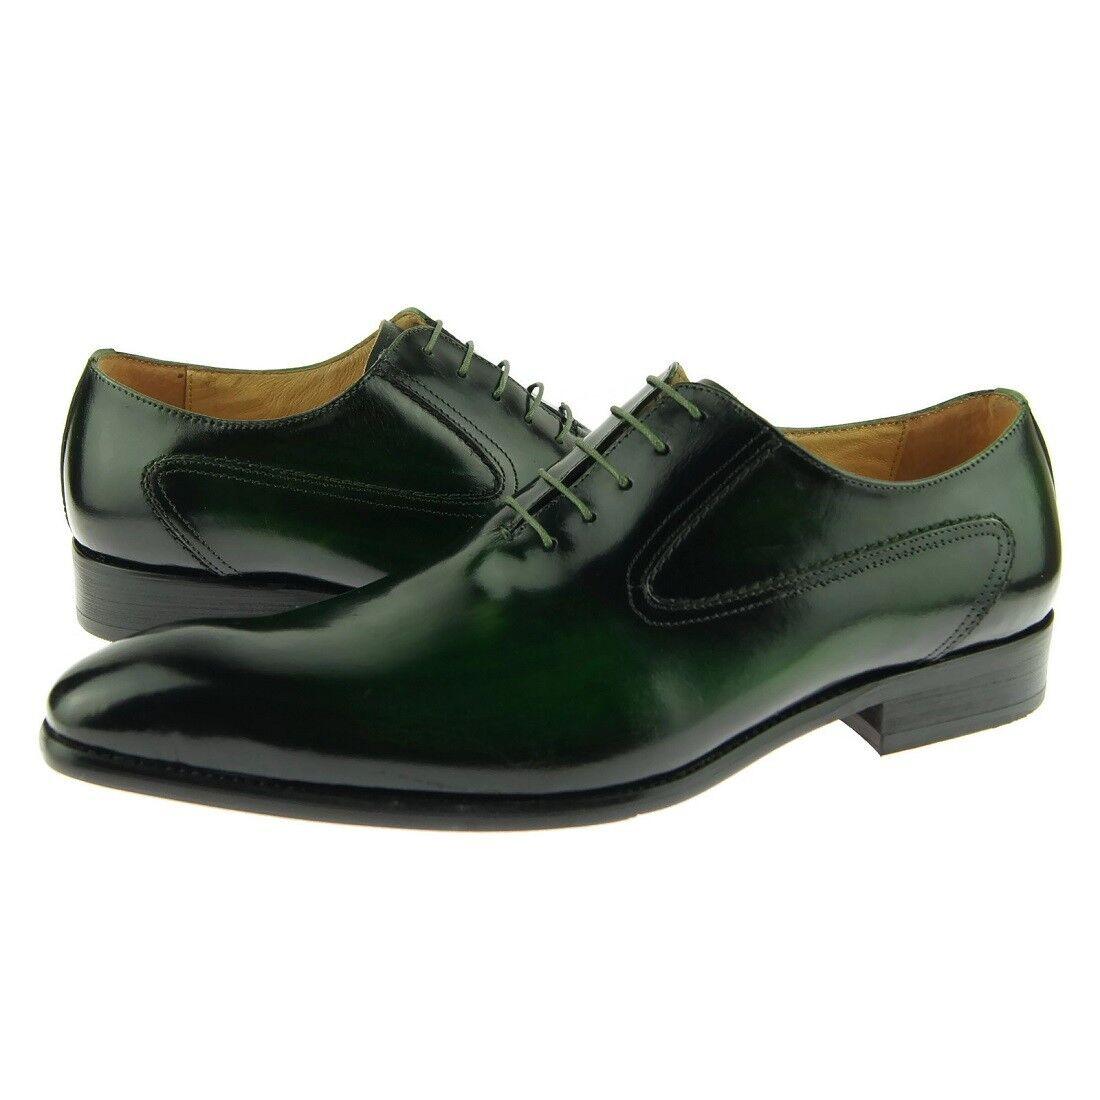 voiturerucci Uni Bout Oxford, Homme   Chaussures Cuir, Émeraude